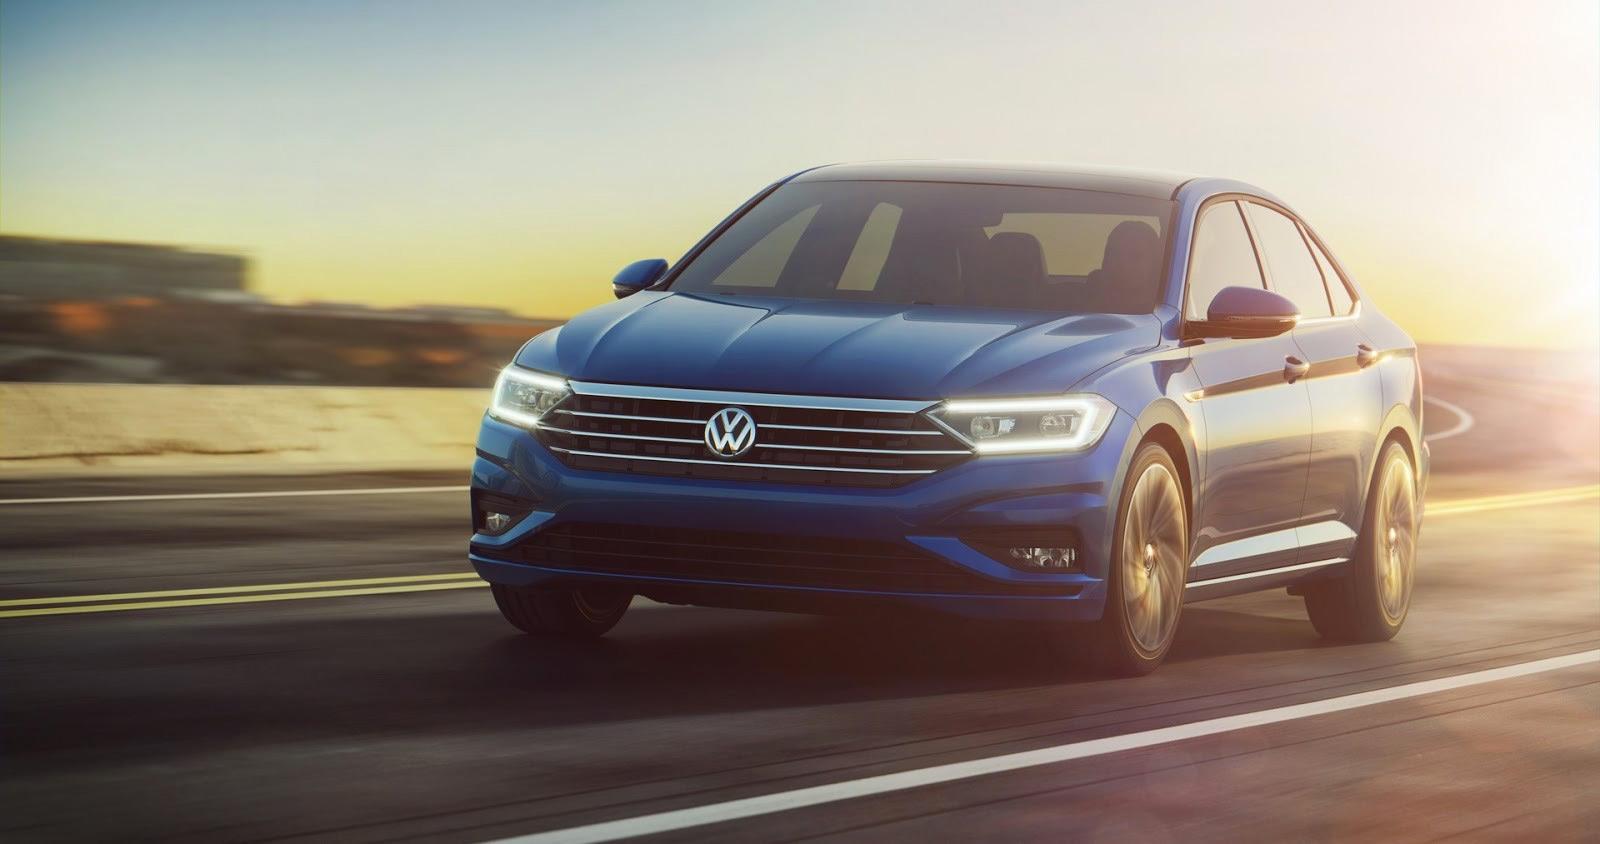 Nuevo Volkswagen Jetta 2019 exterior frente